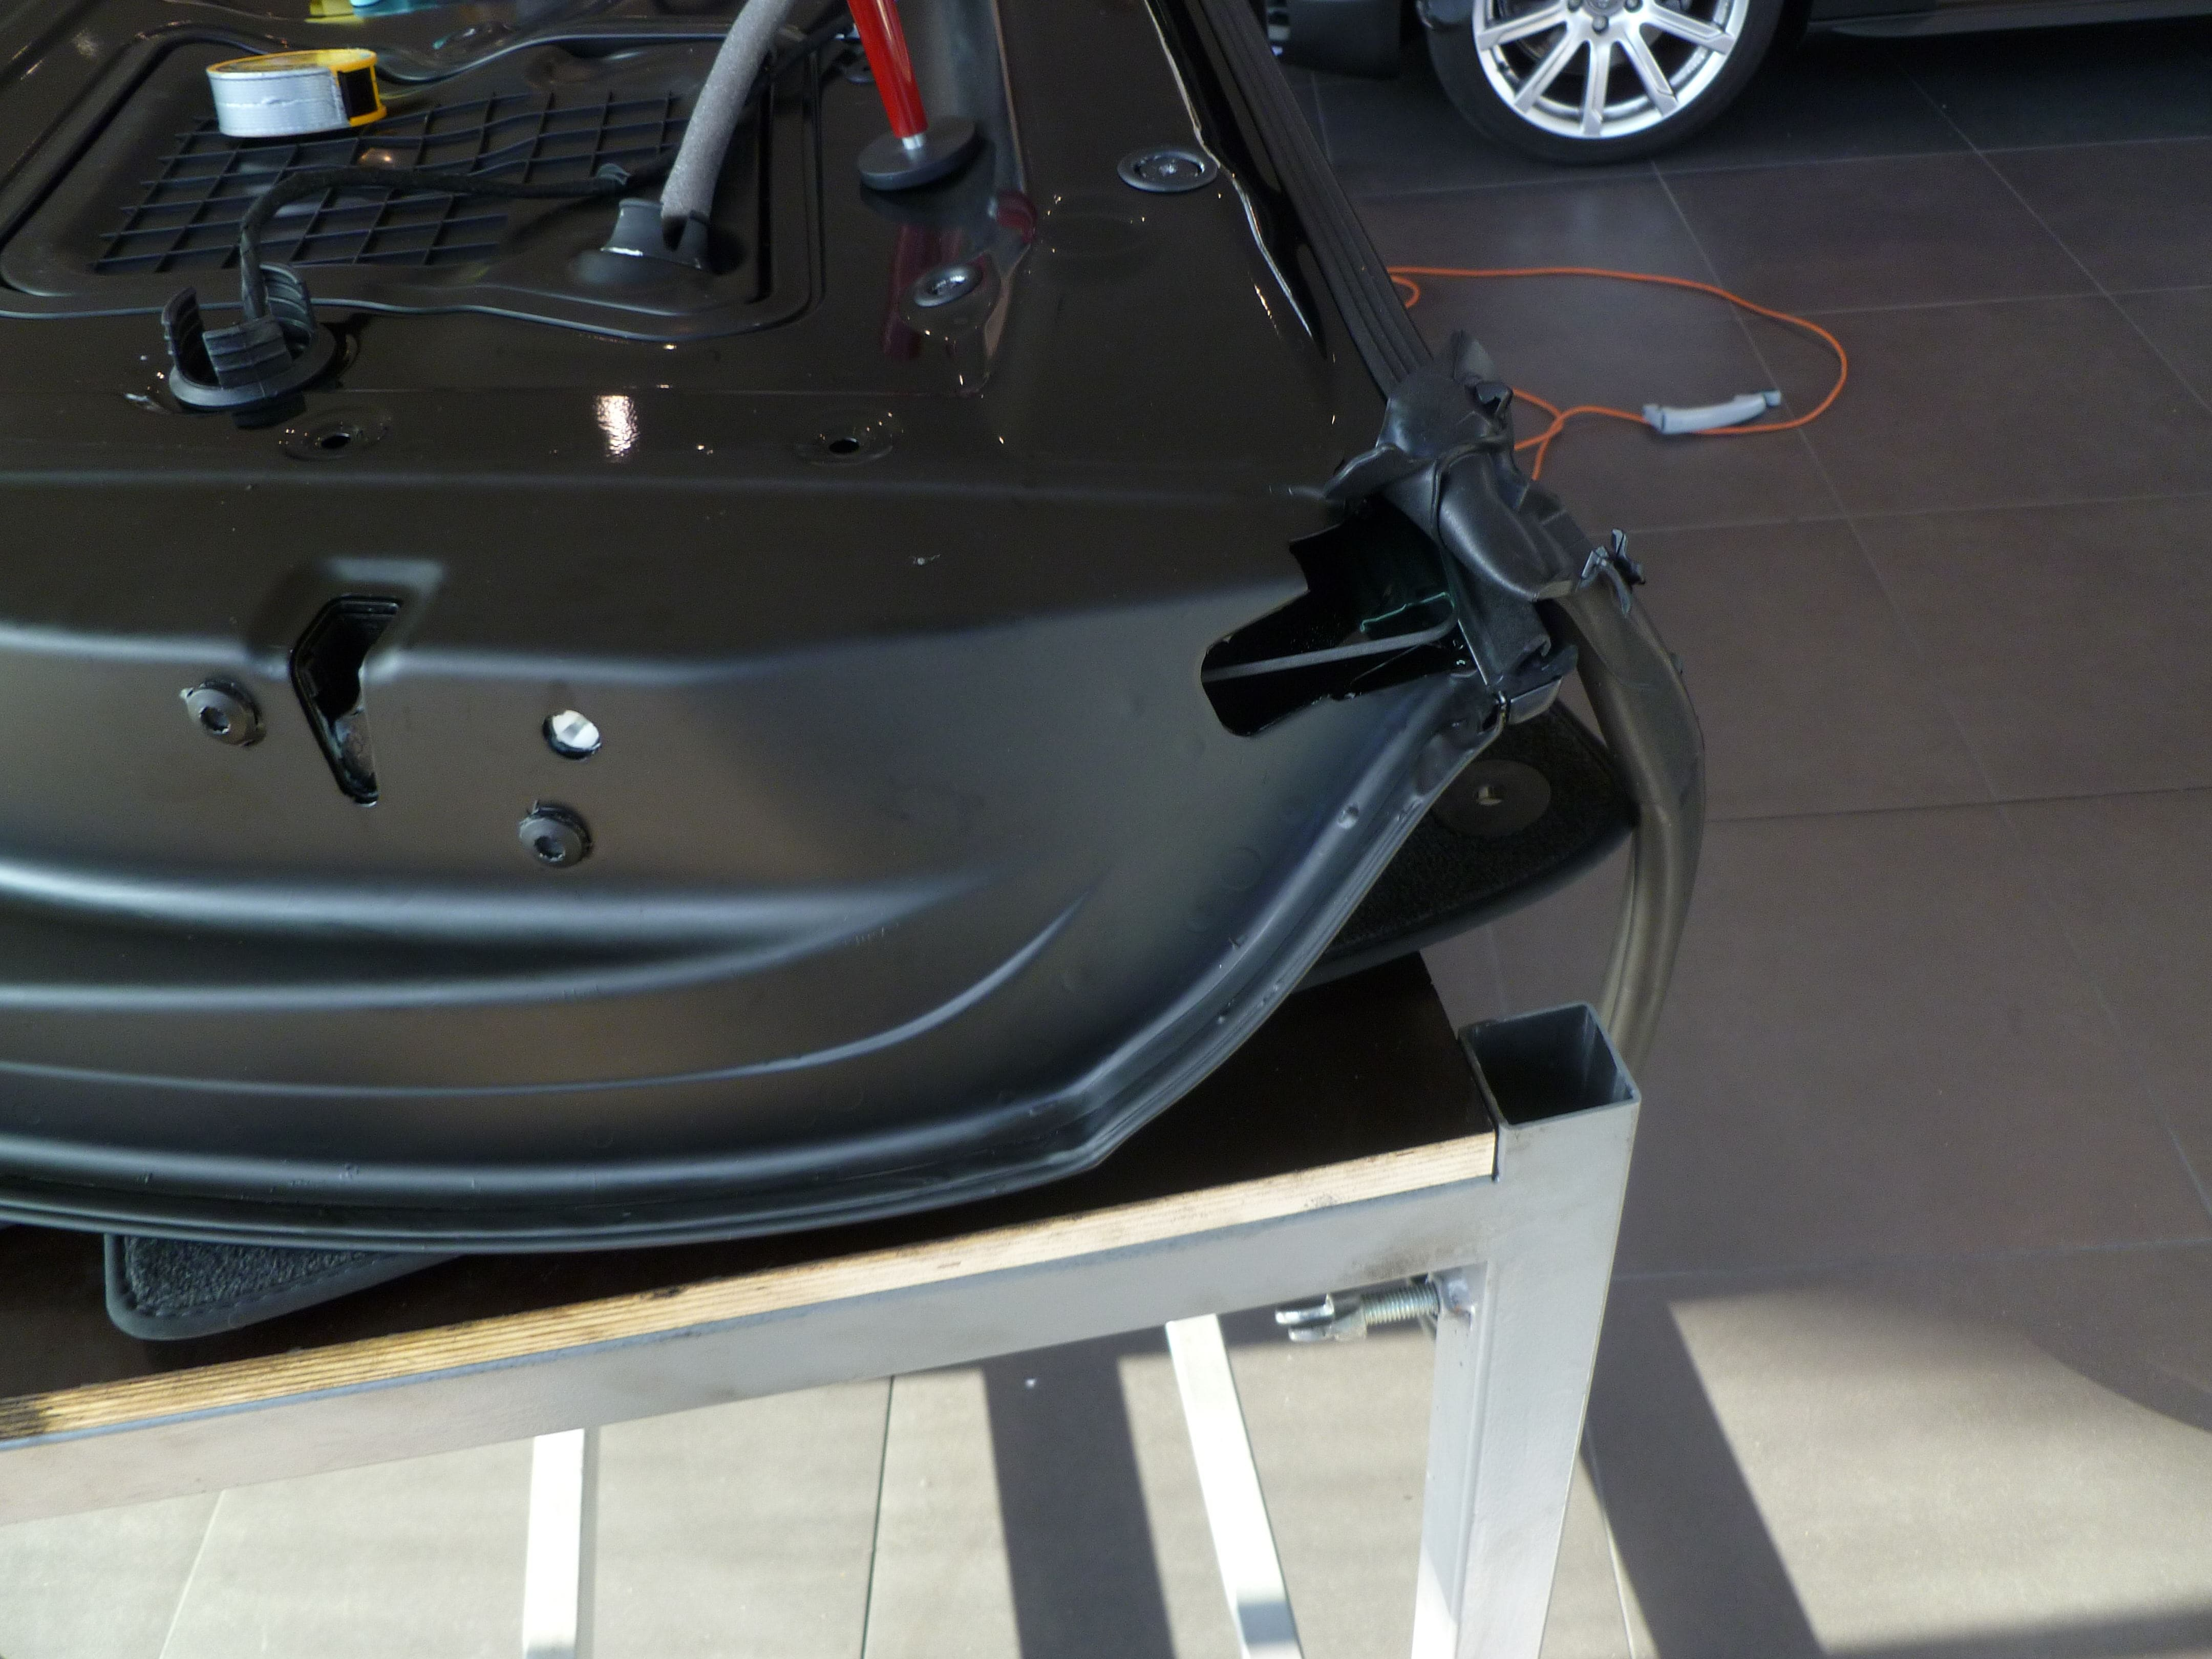 Audi A5 Coupe met Mat Zwarte Wrap, Carwrapping door Wrapmyride.nu Foto-nr:4640, ©2021